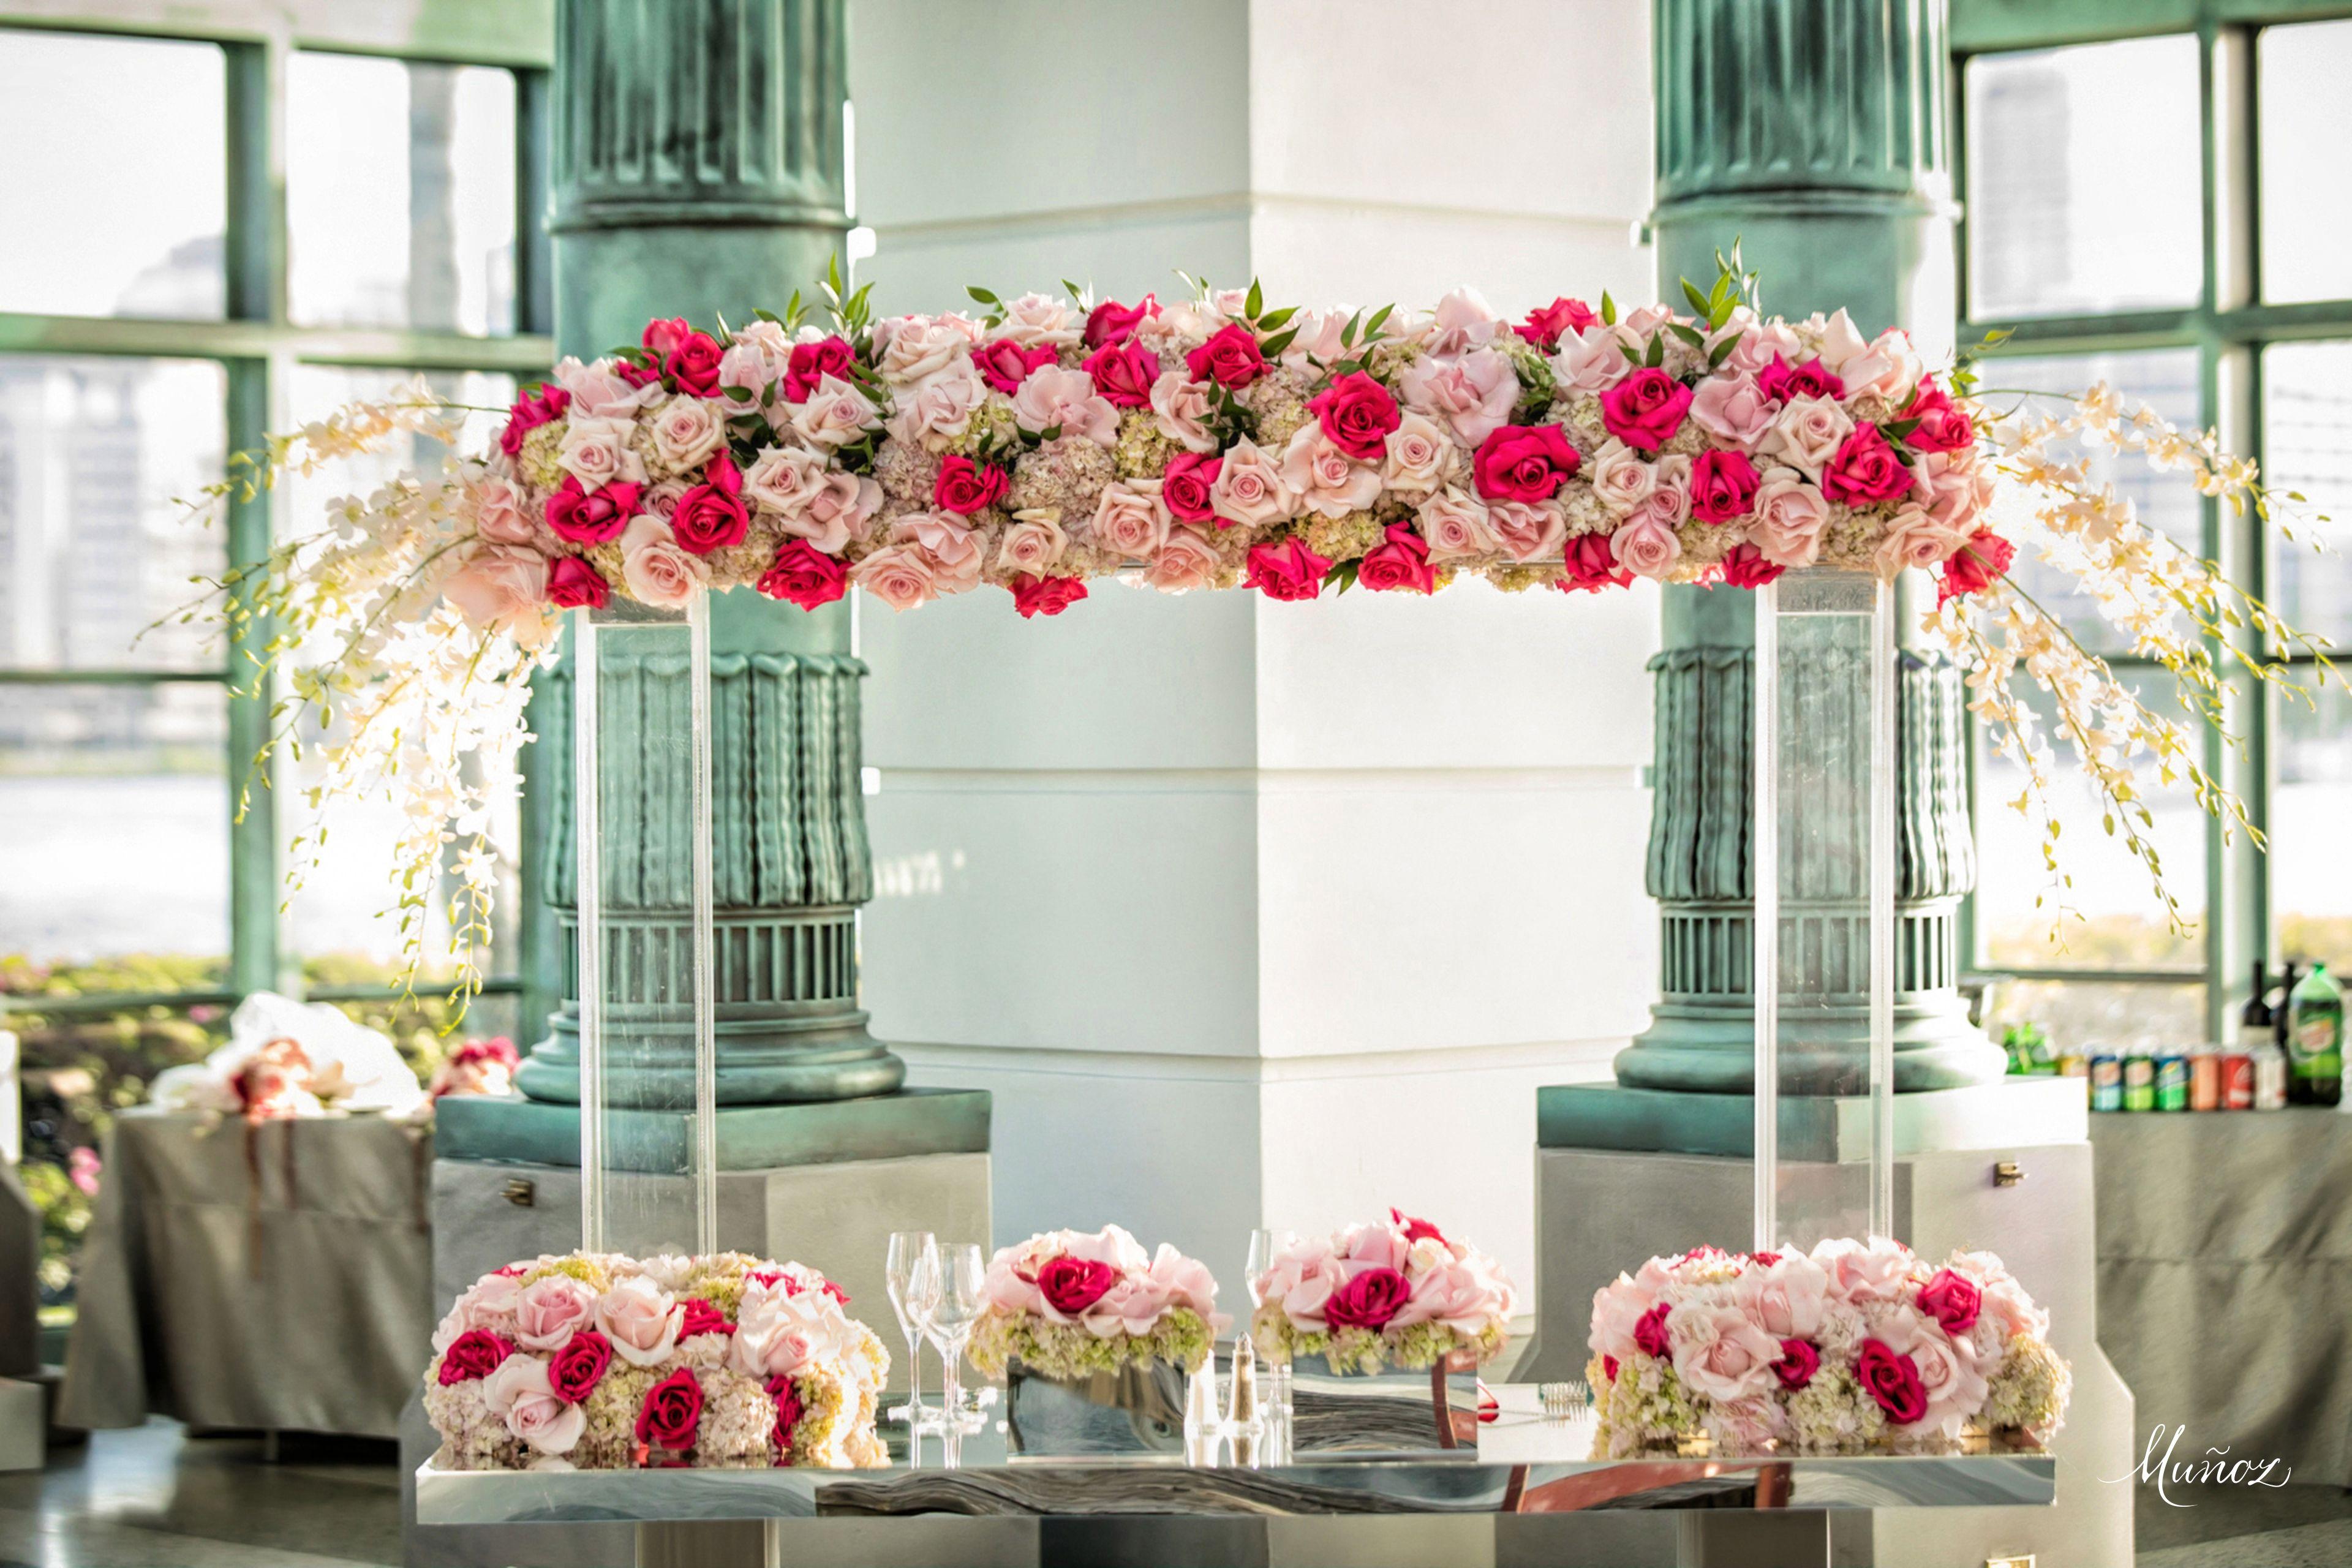 Wedding decoration ideas burgundy  Xquisite Events South Floridaus Premiere Event Decor and Production